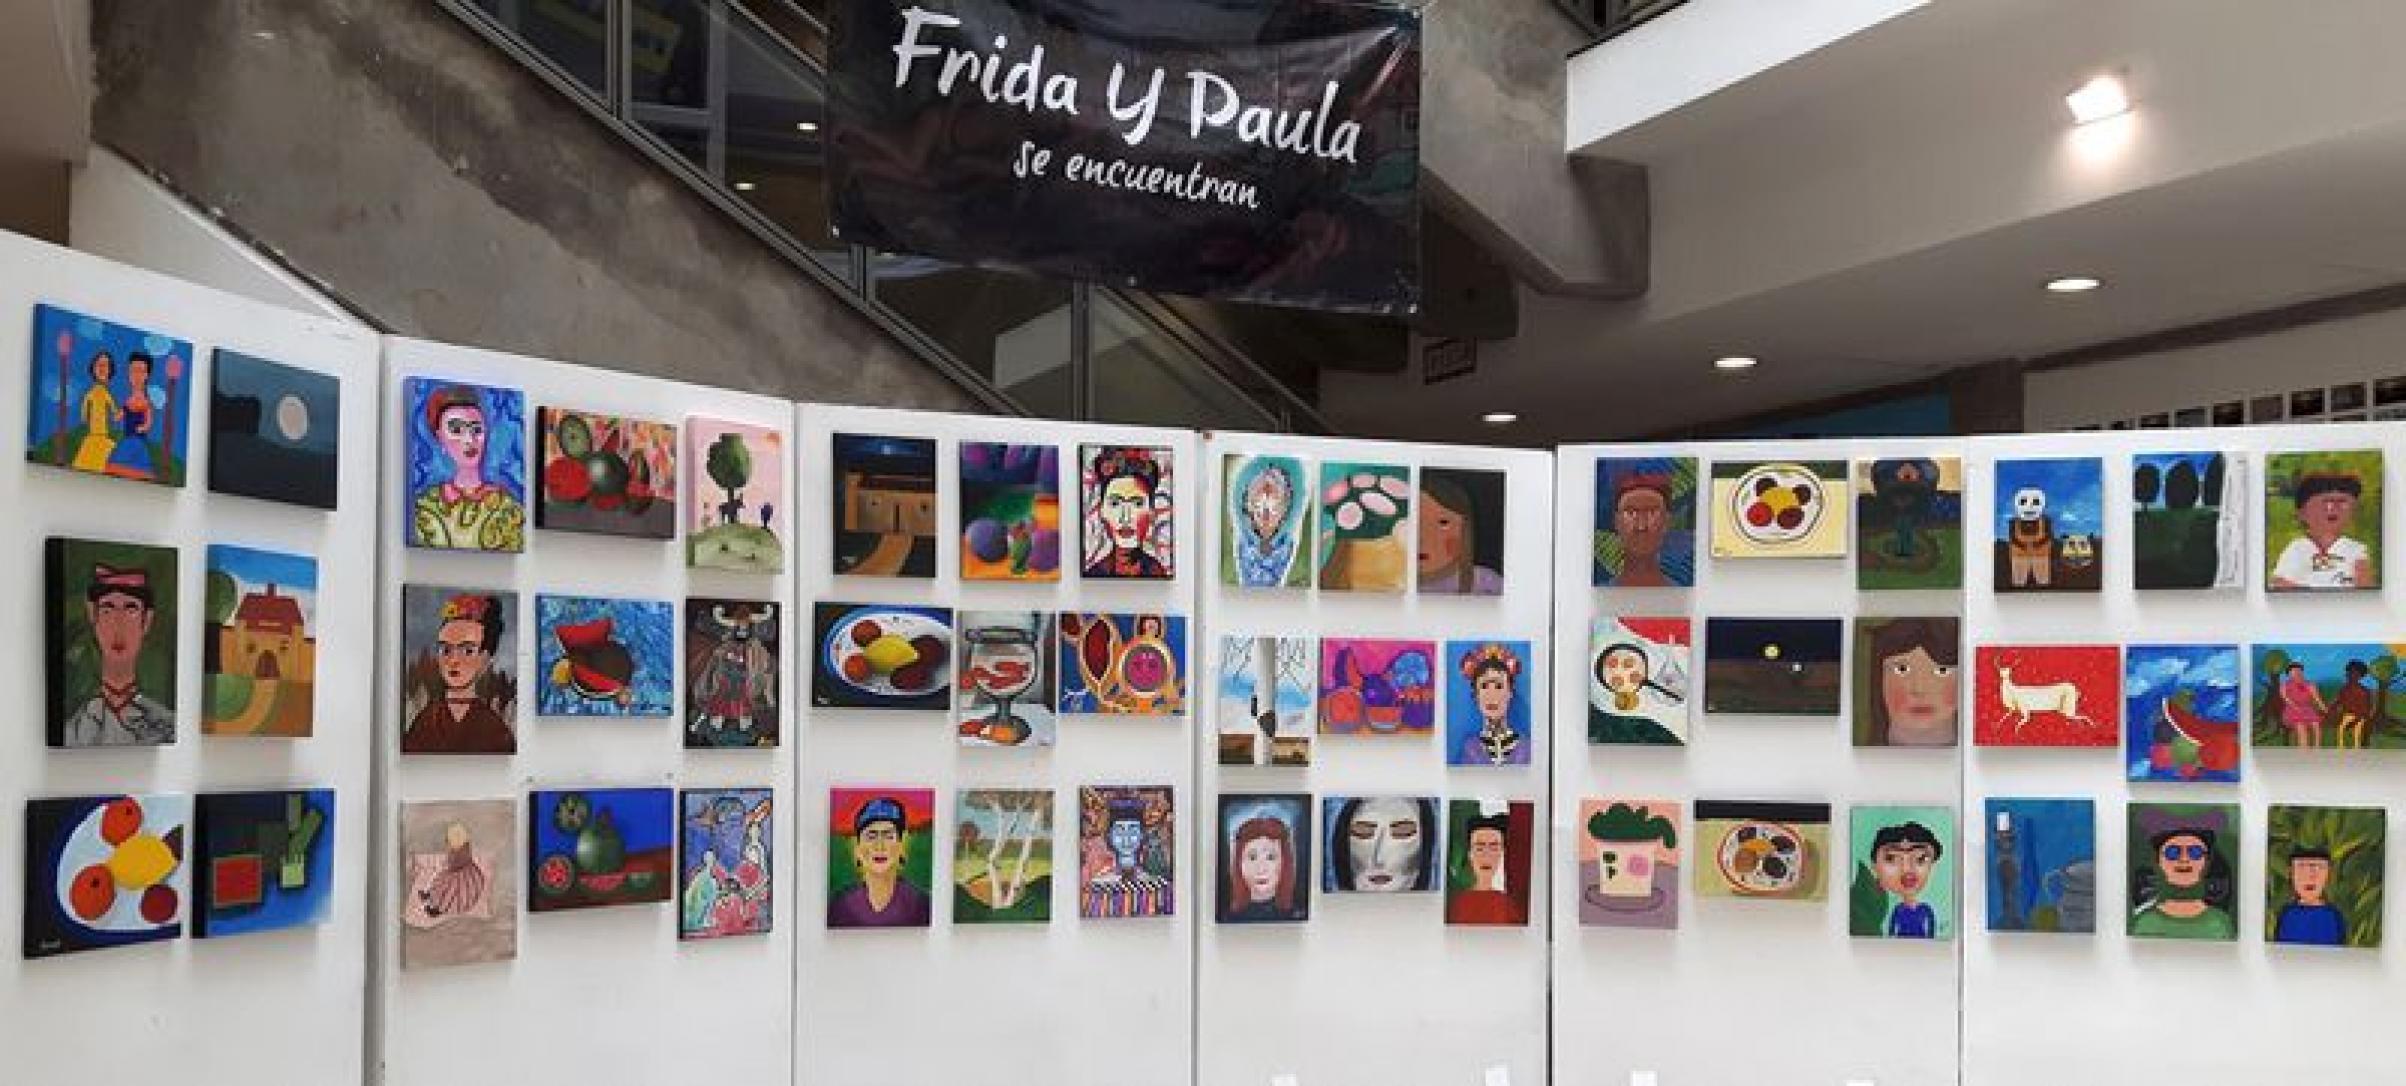 Frida Trifft Paula Austausch Macht Schule